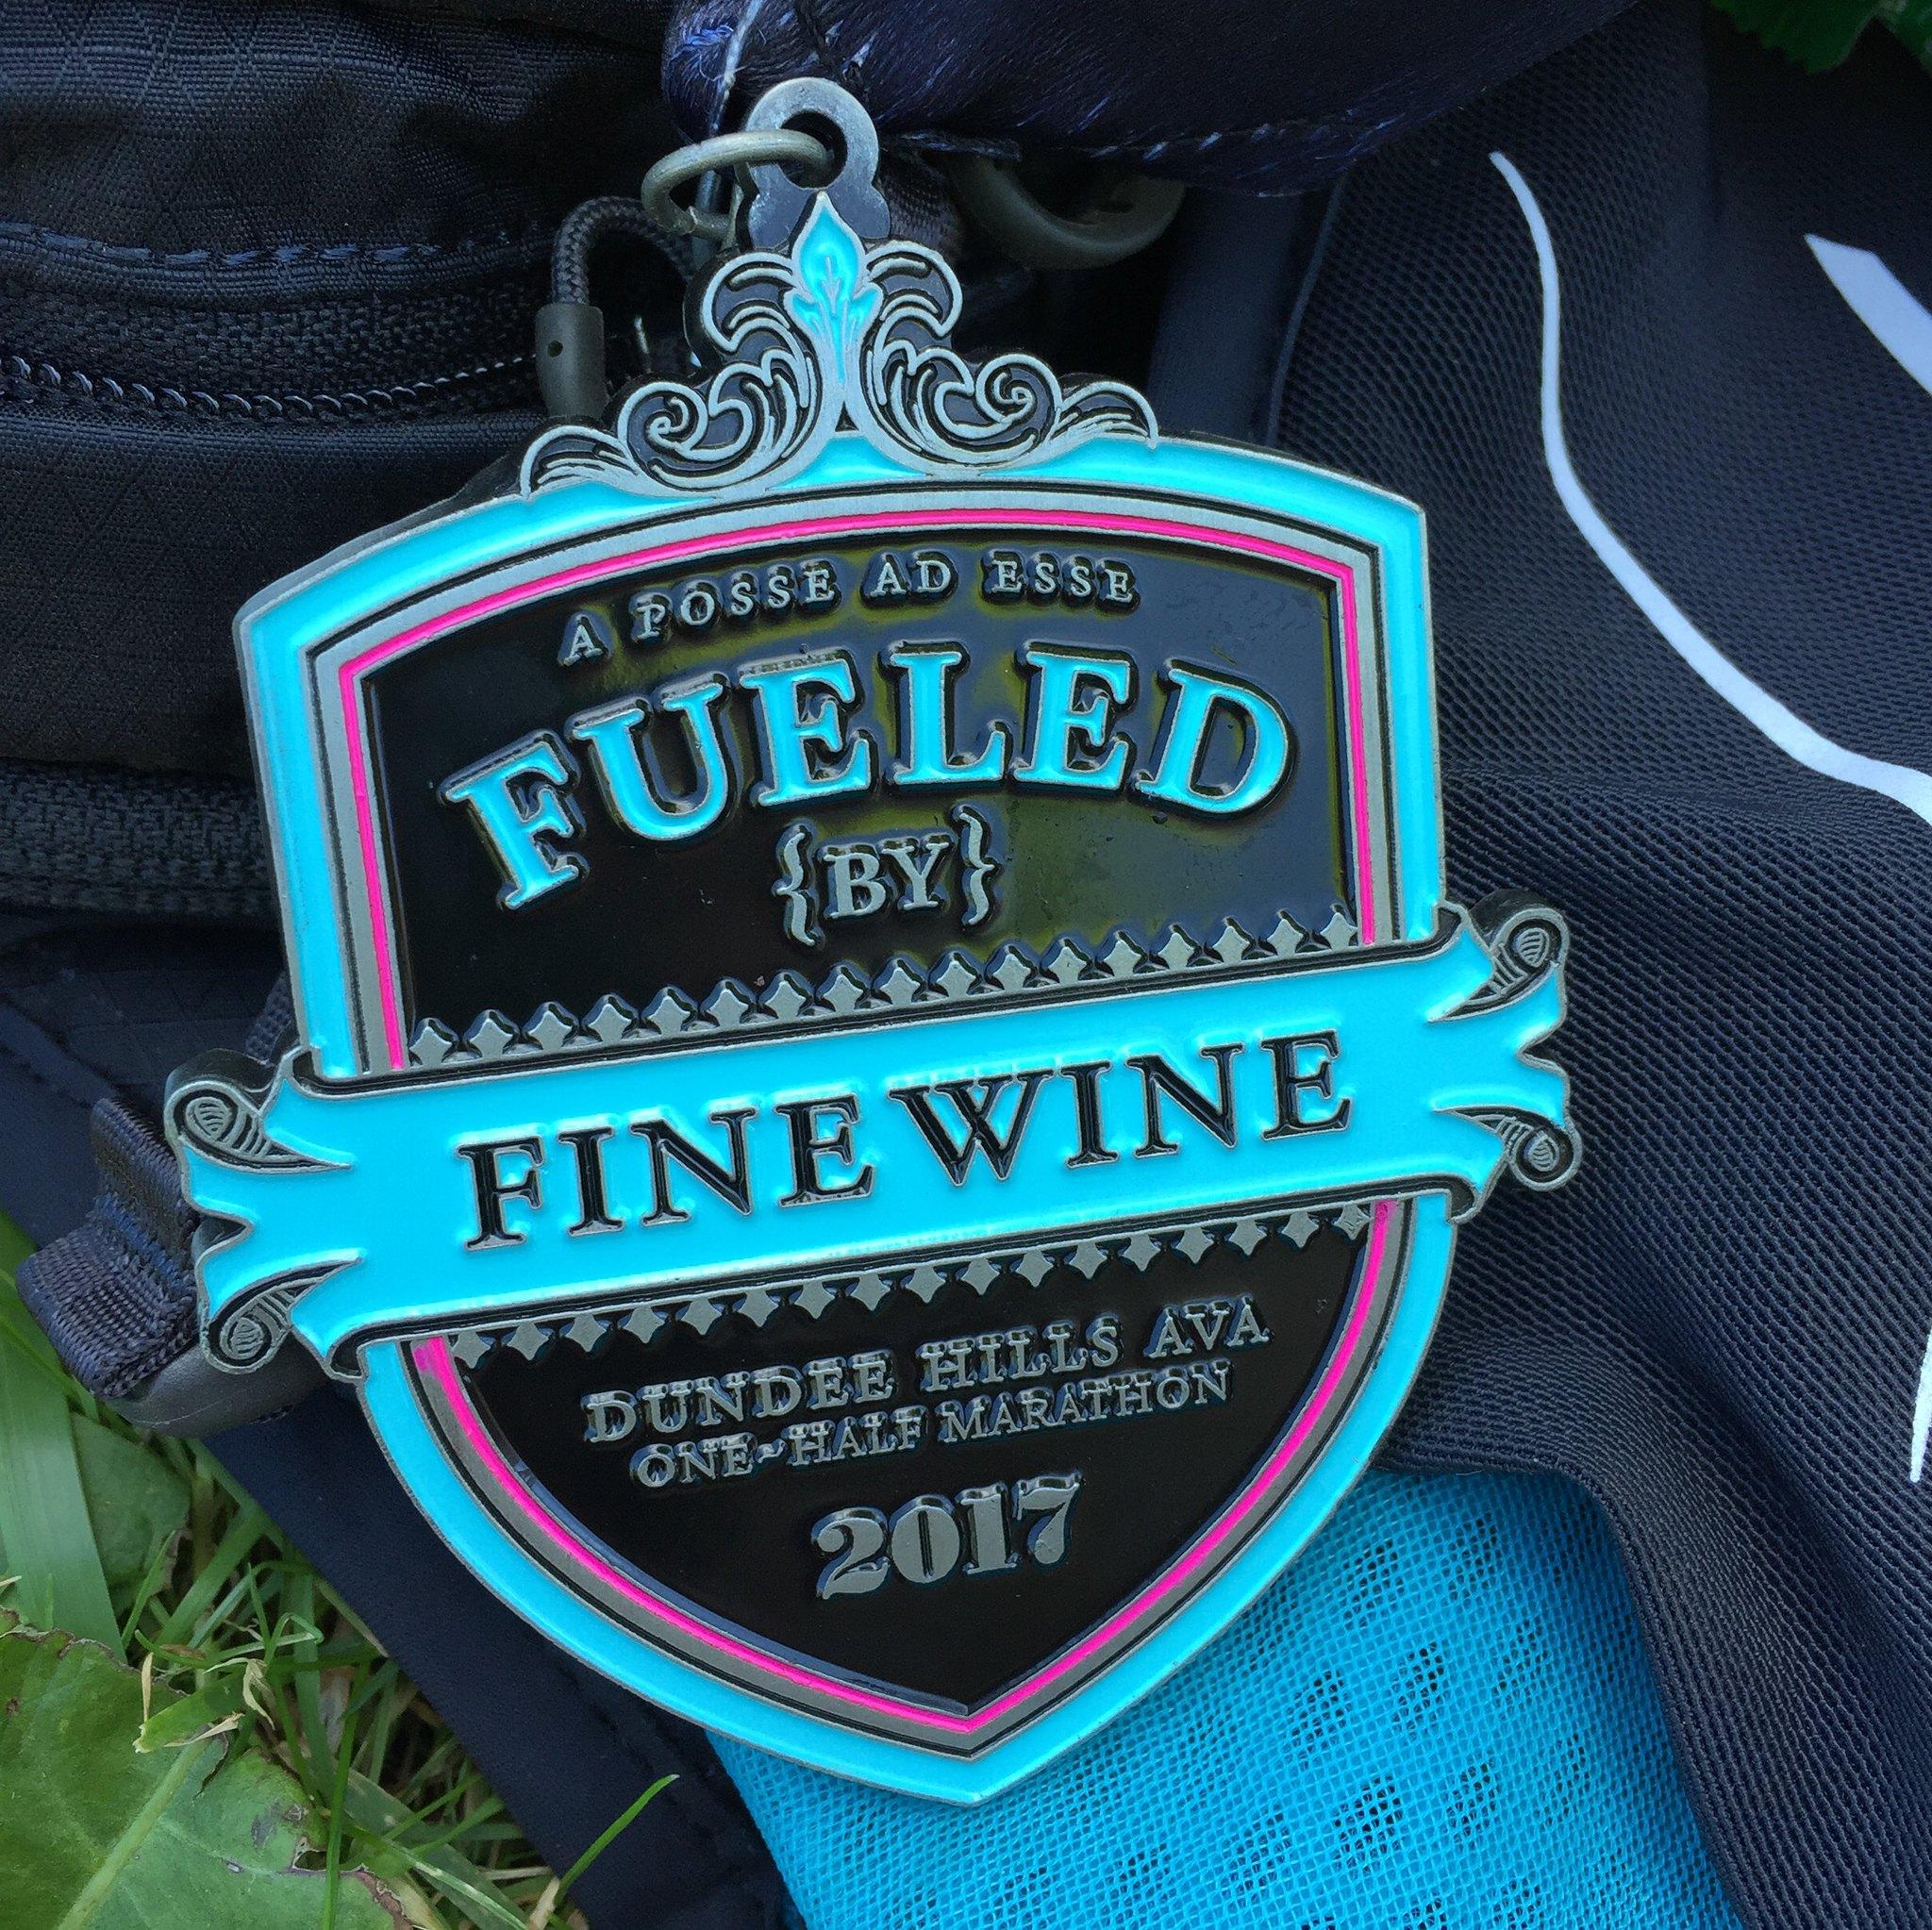 2017 FBFW Half